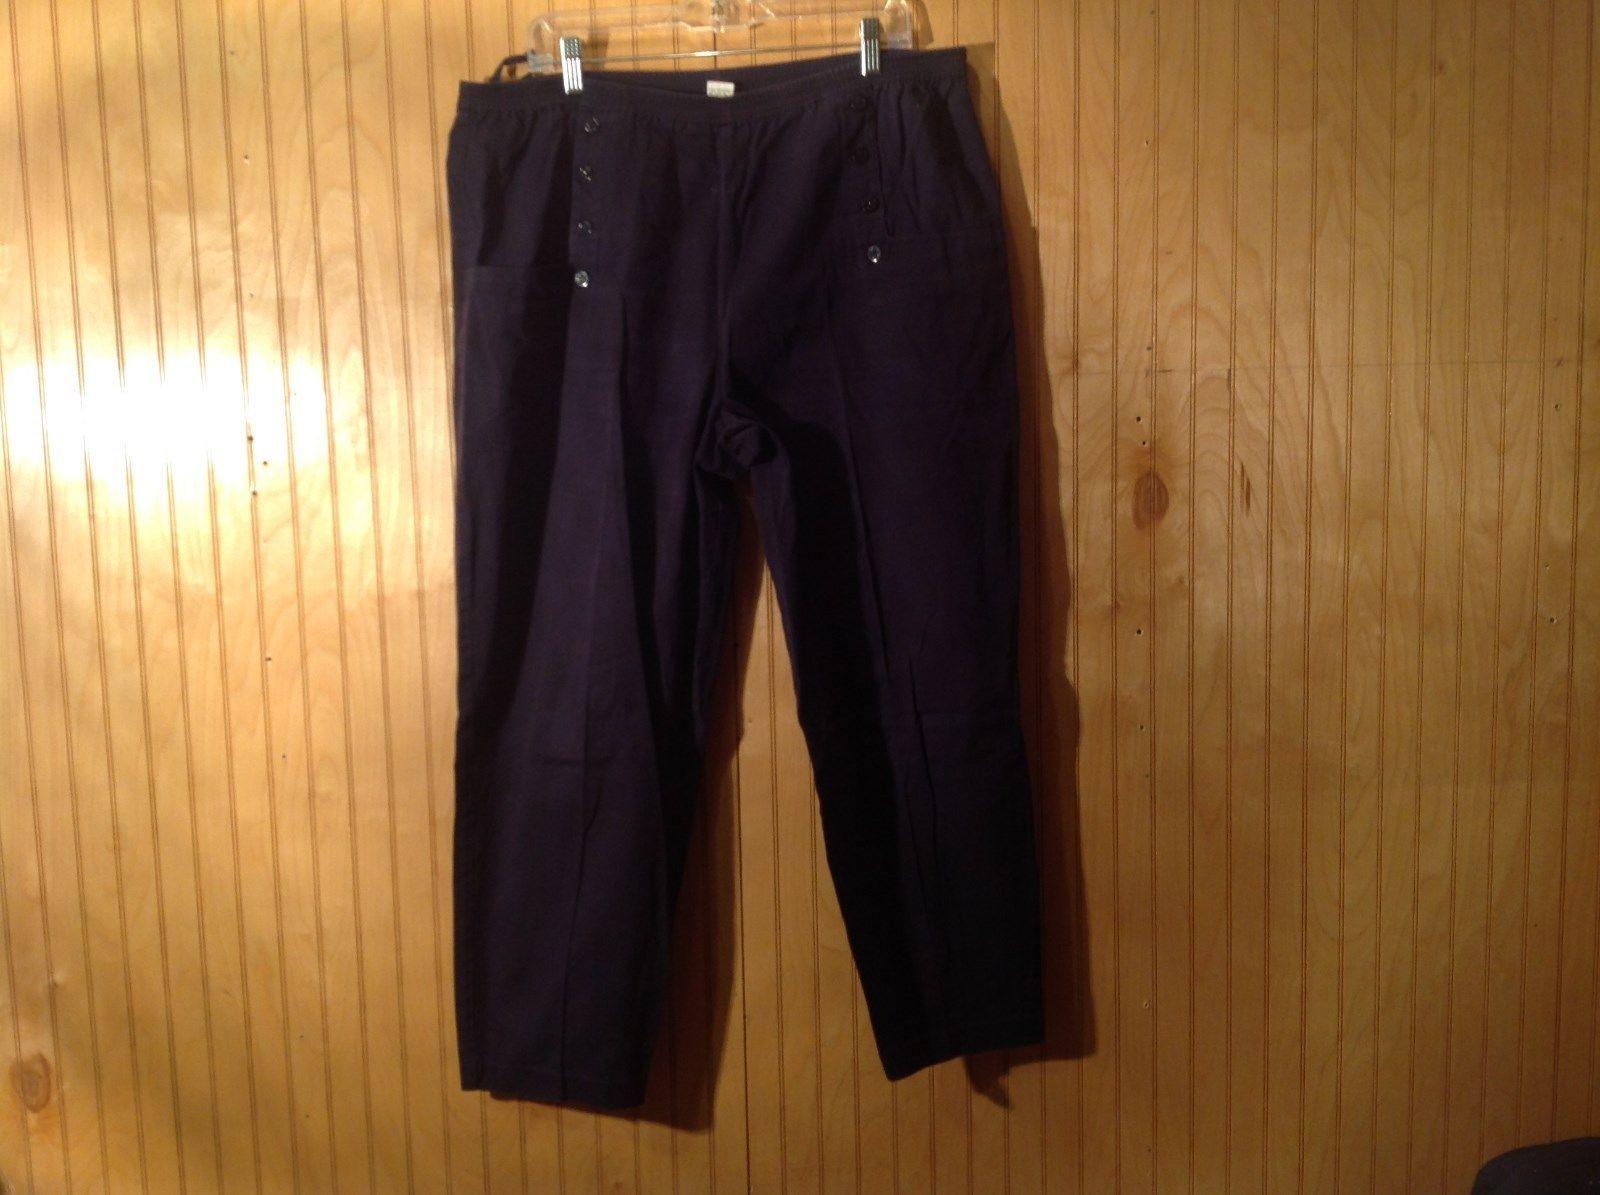 100 Percent Cotton Dark Blue Stretchy Waist Pants Tara Vanessa Pants